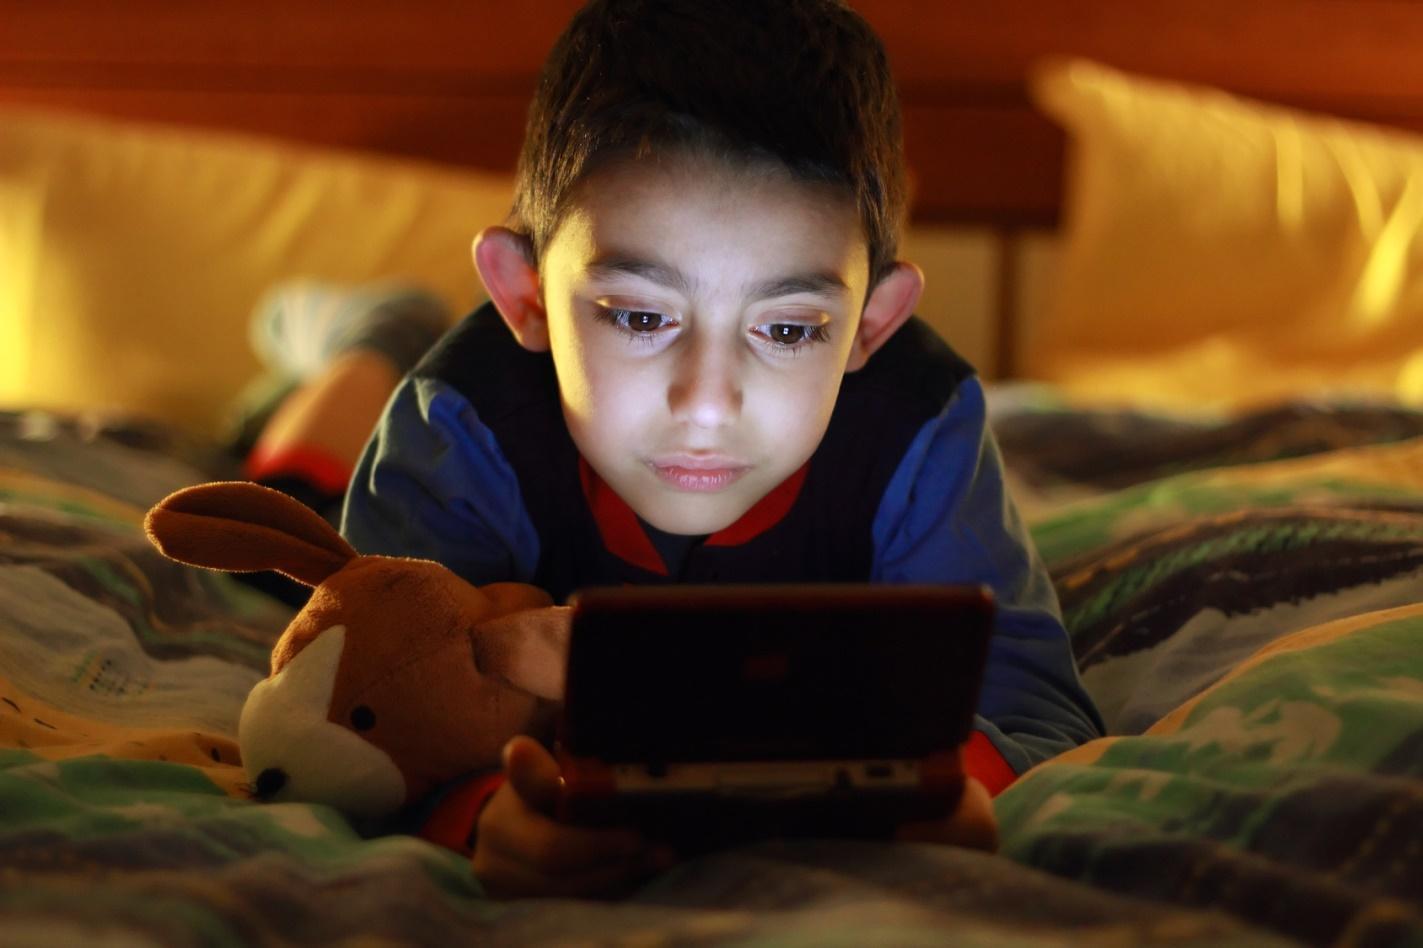 Daytime Bed Wetting for Children